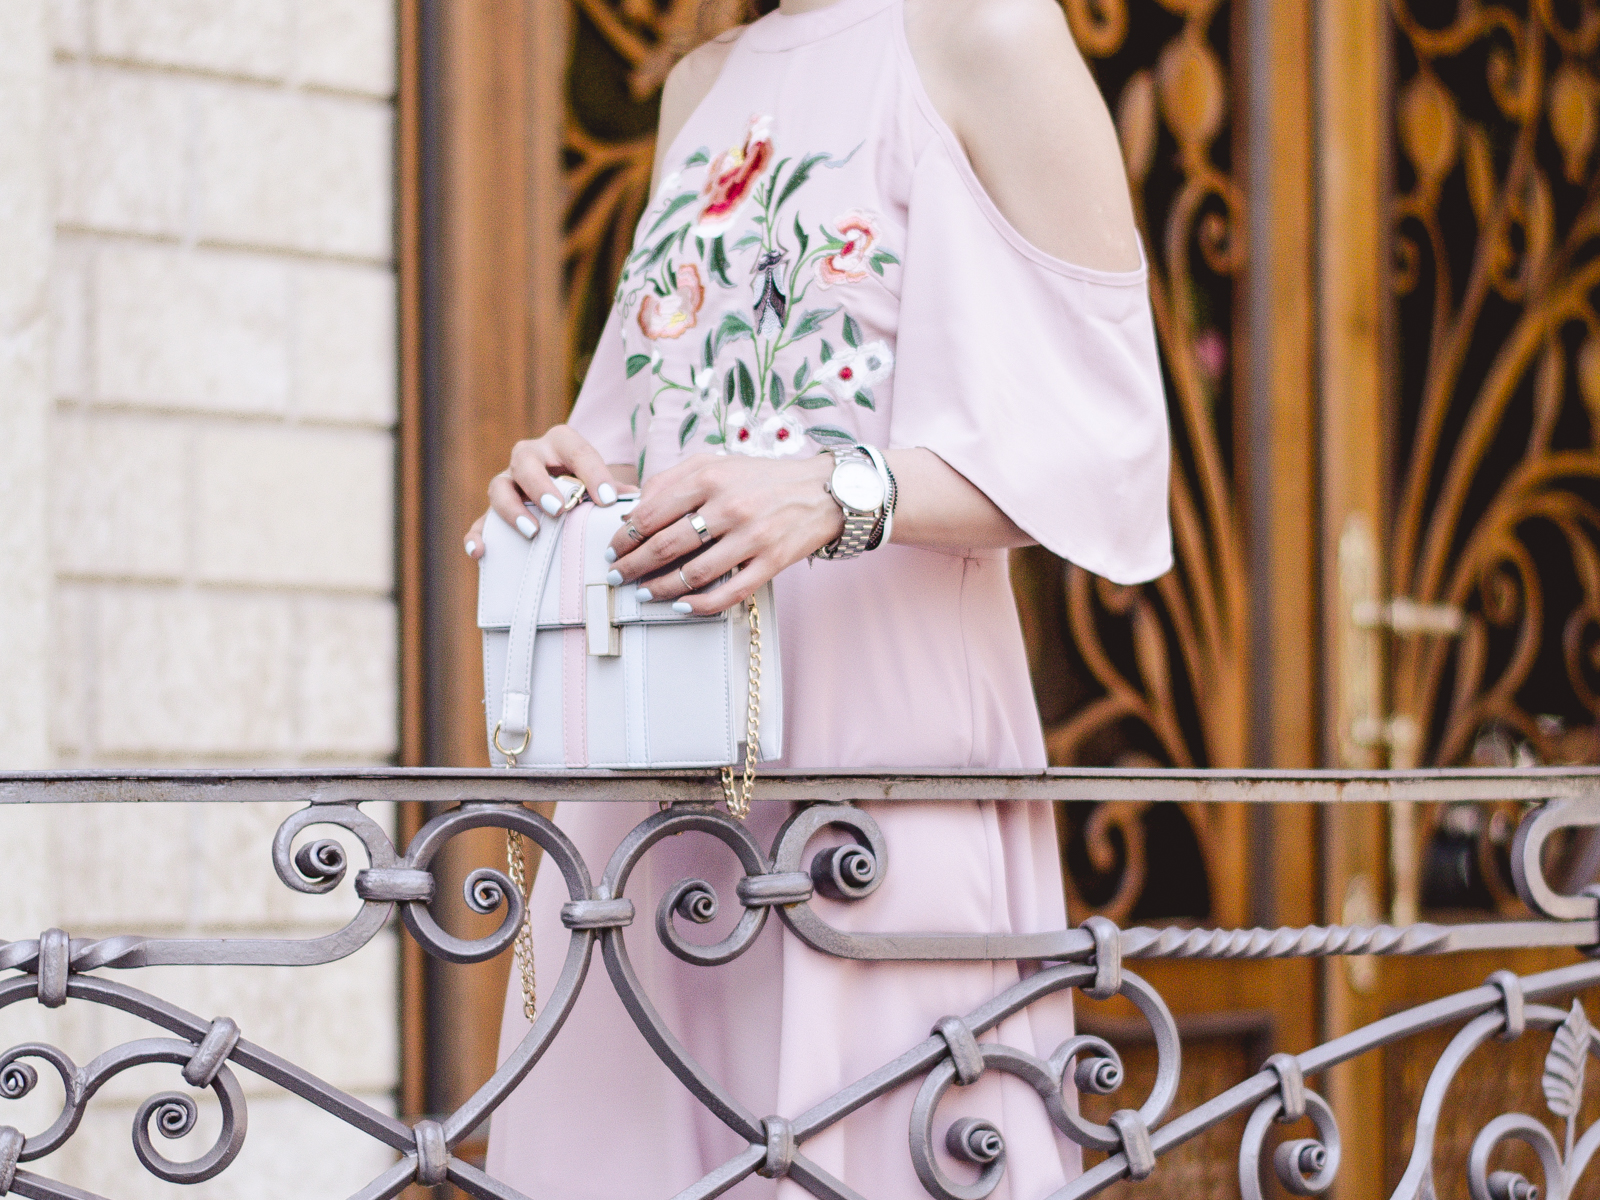 fashion blogger diyorasnotes diyora beta pink mini dress cold shoulders white mules straw hat